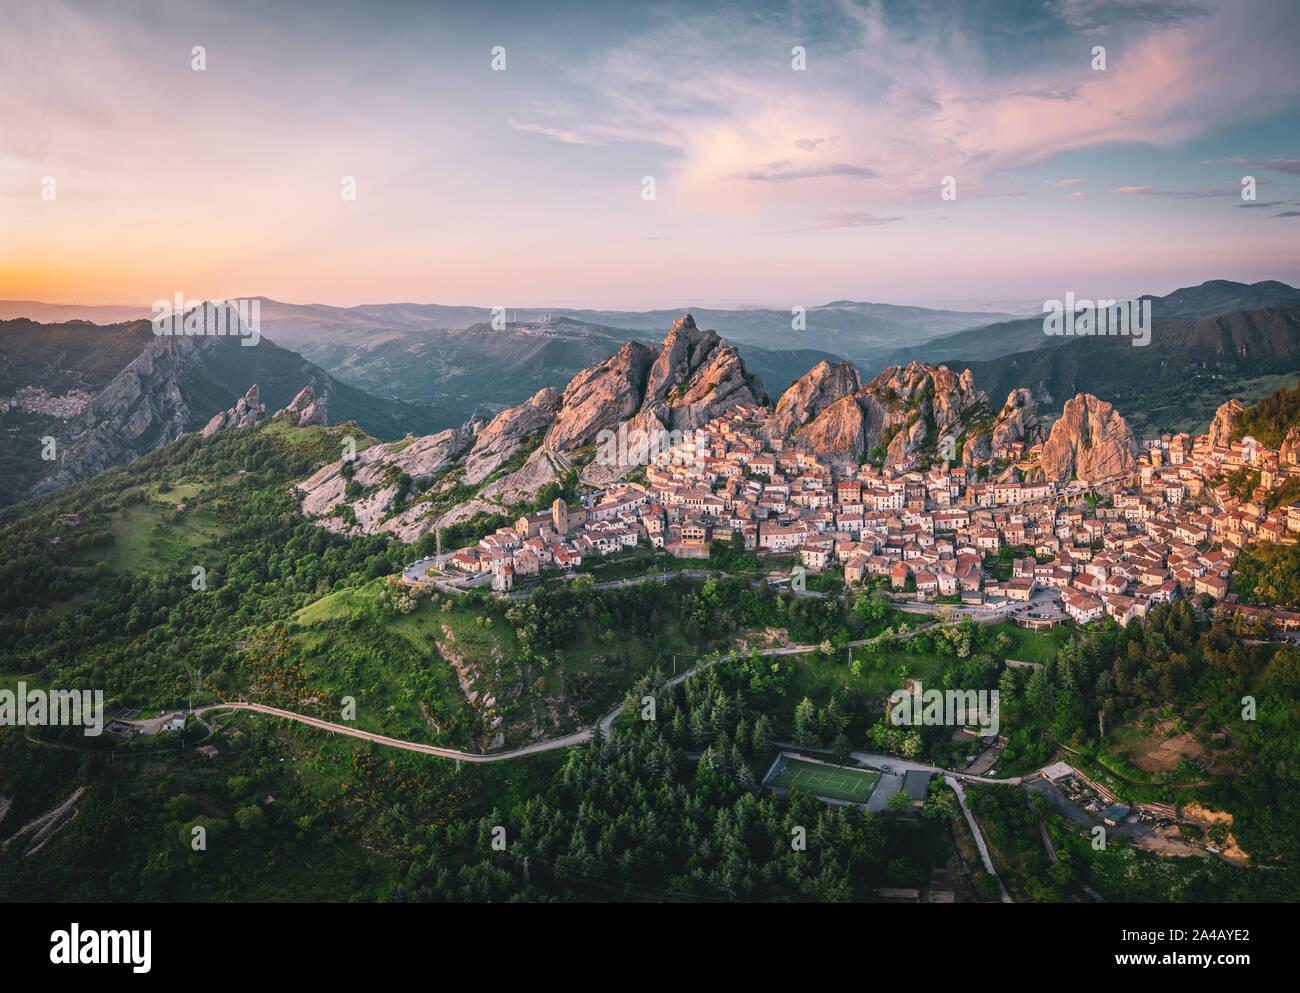 Aerial view of Pietrapertosa rural village in Apennines Dolomiti Lucane. Basilicata, Italy, at sunset Stock Photo